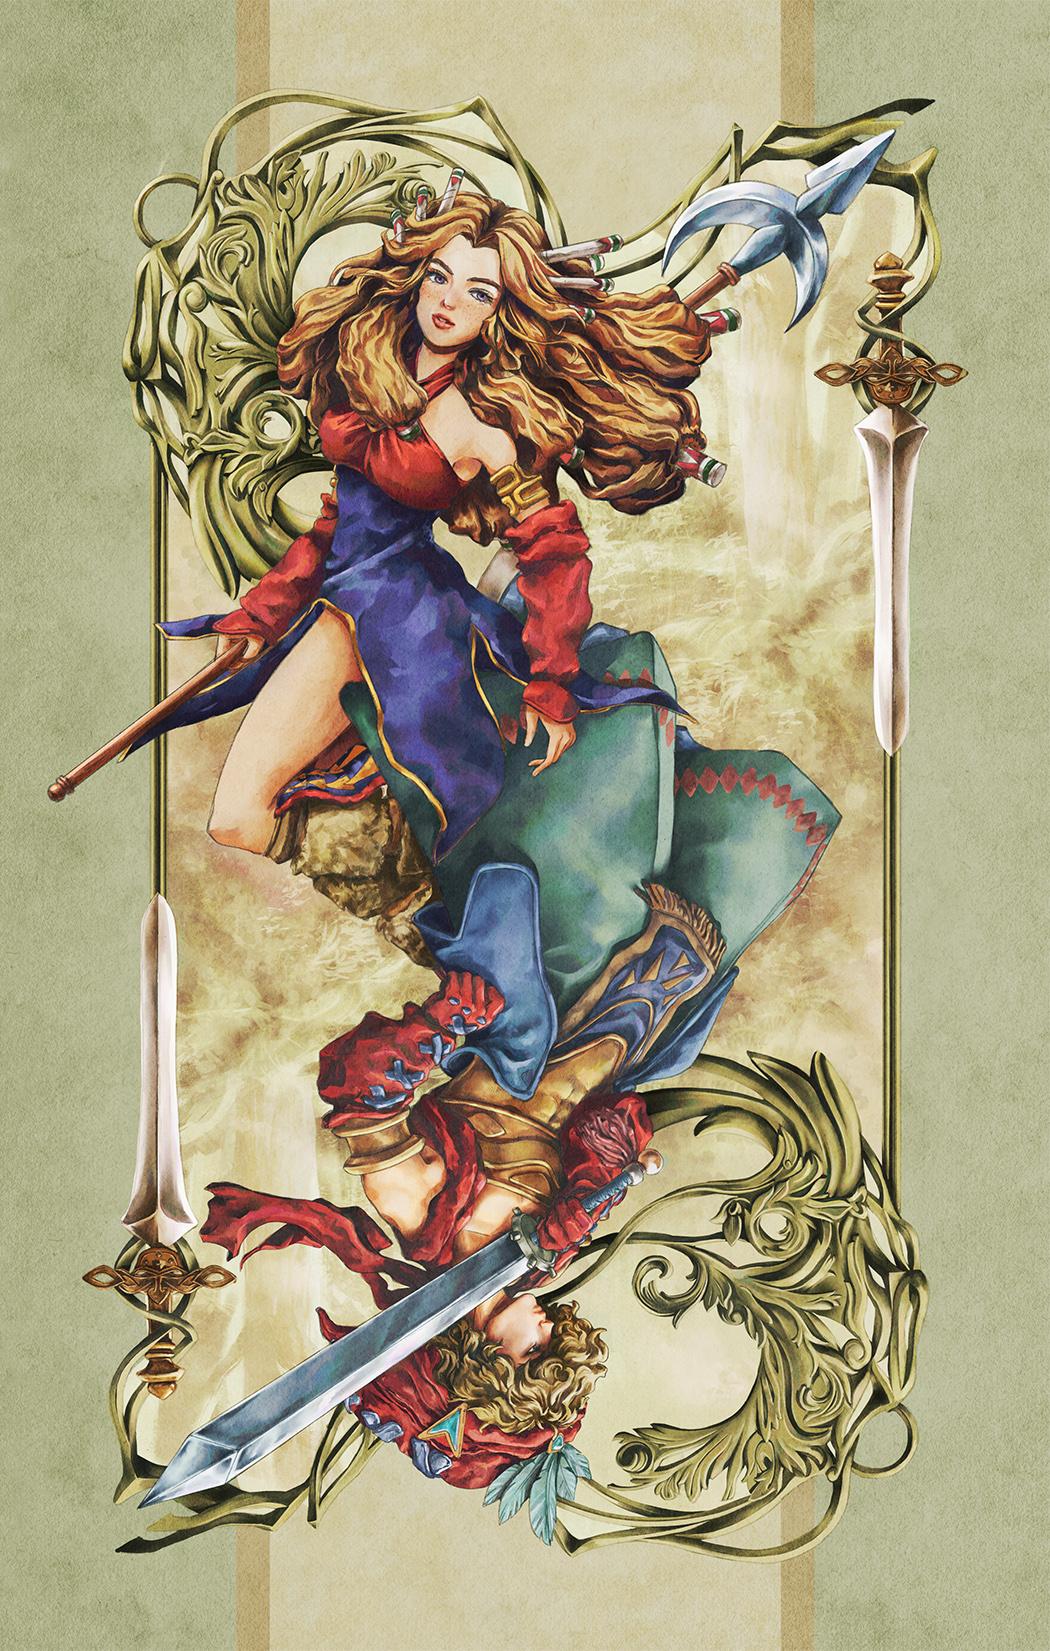 Paola Tuazon - 聖剣伝説 Seiken Densetsu: Legend of Mana - Heroine Female Character Fanart PS1 JRPG Game